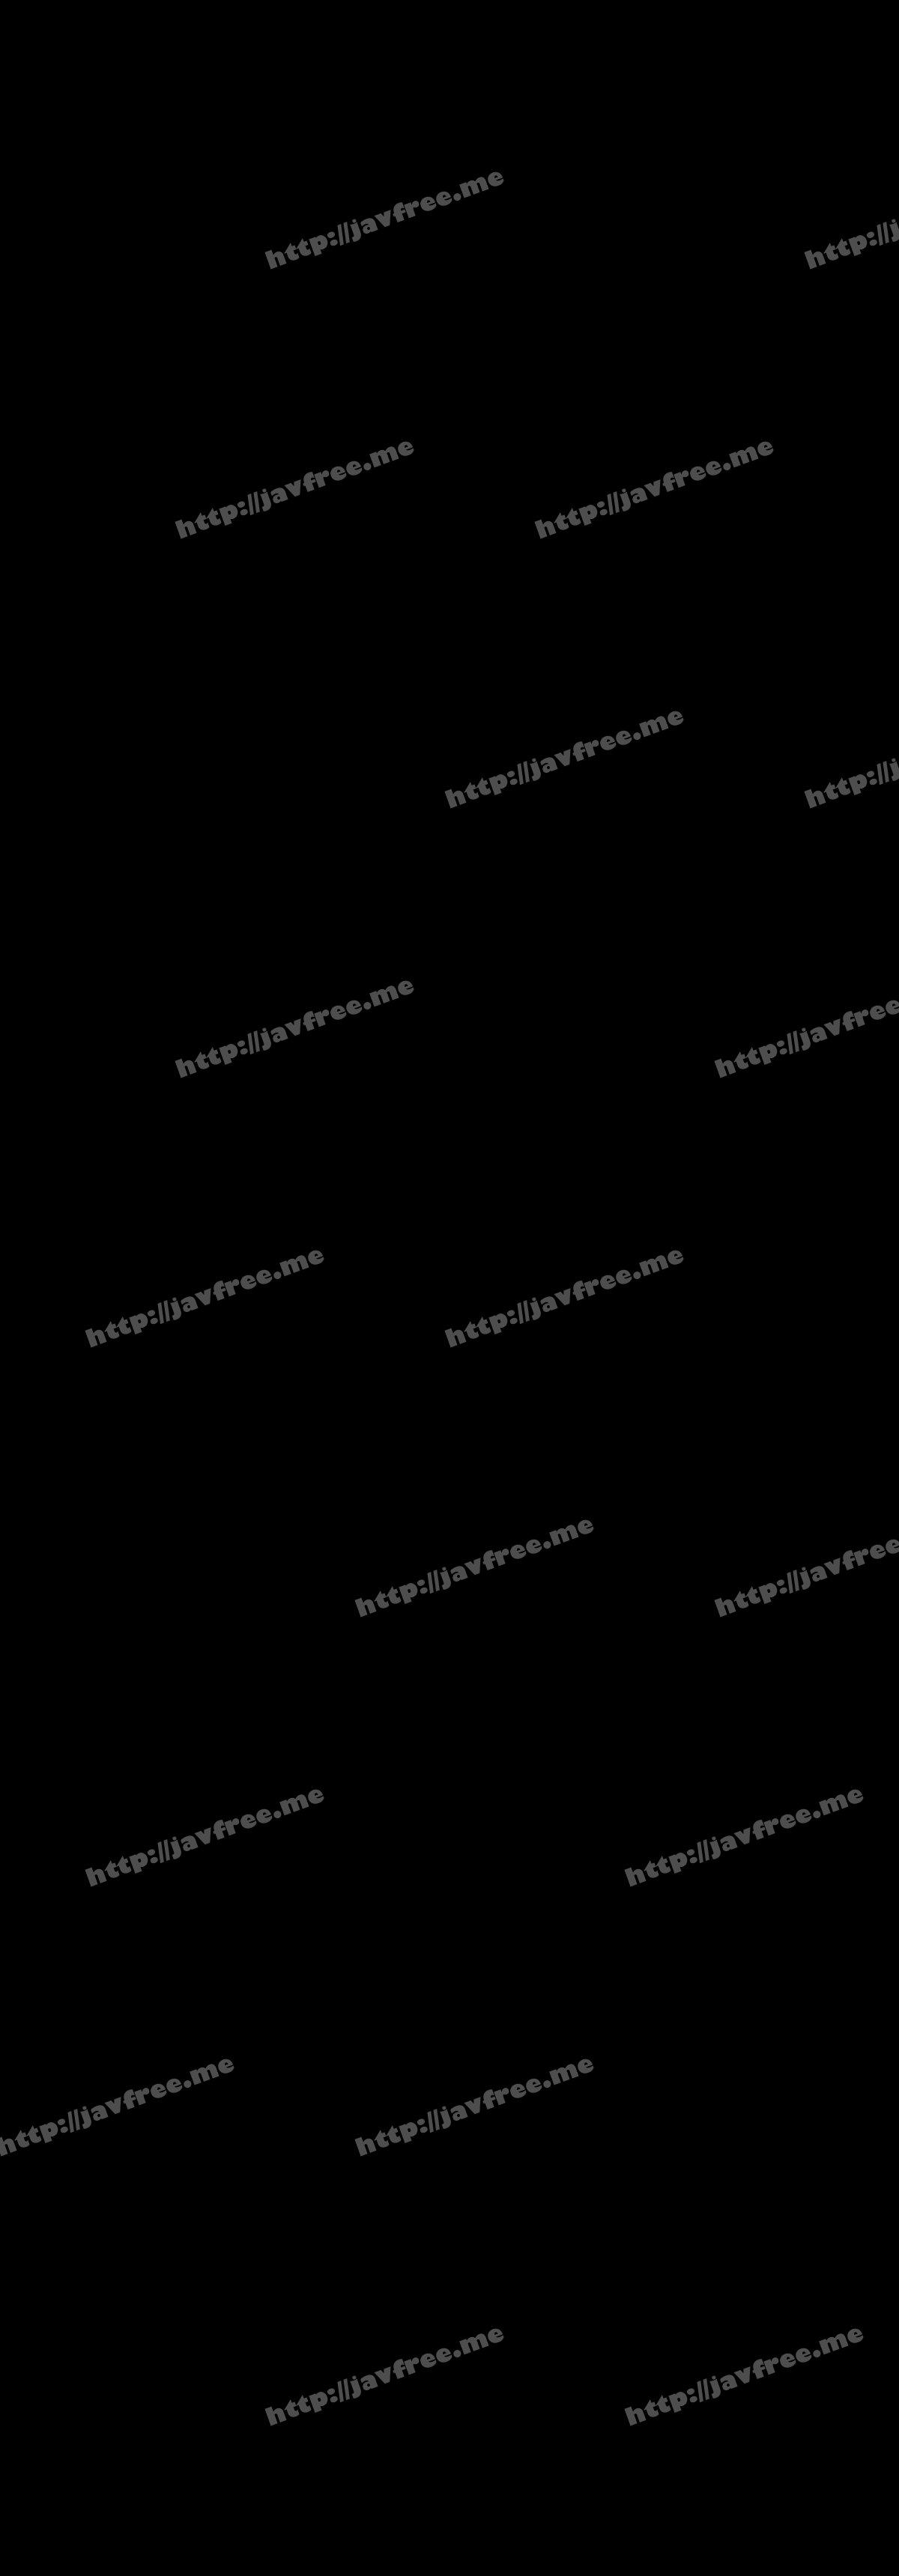 [HD][JRZD-899] 初撮り人妻ドキュメント 壇香里 - image JRZD-899-1080p on https://javfree.me